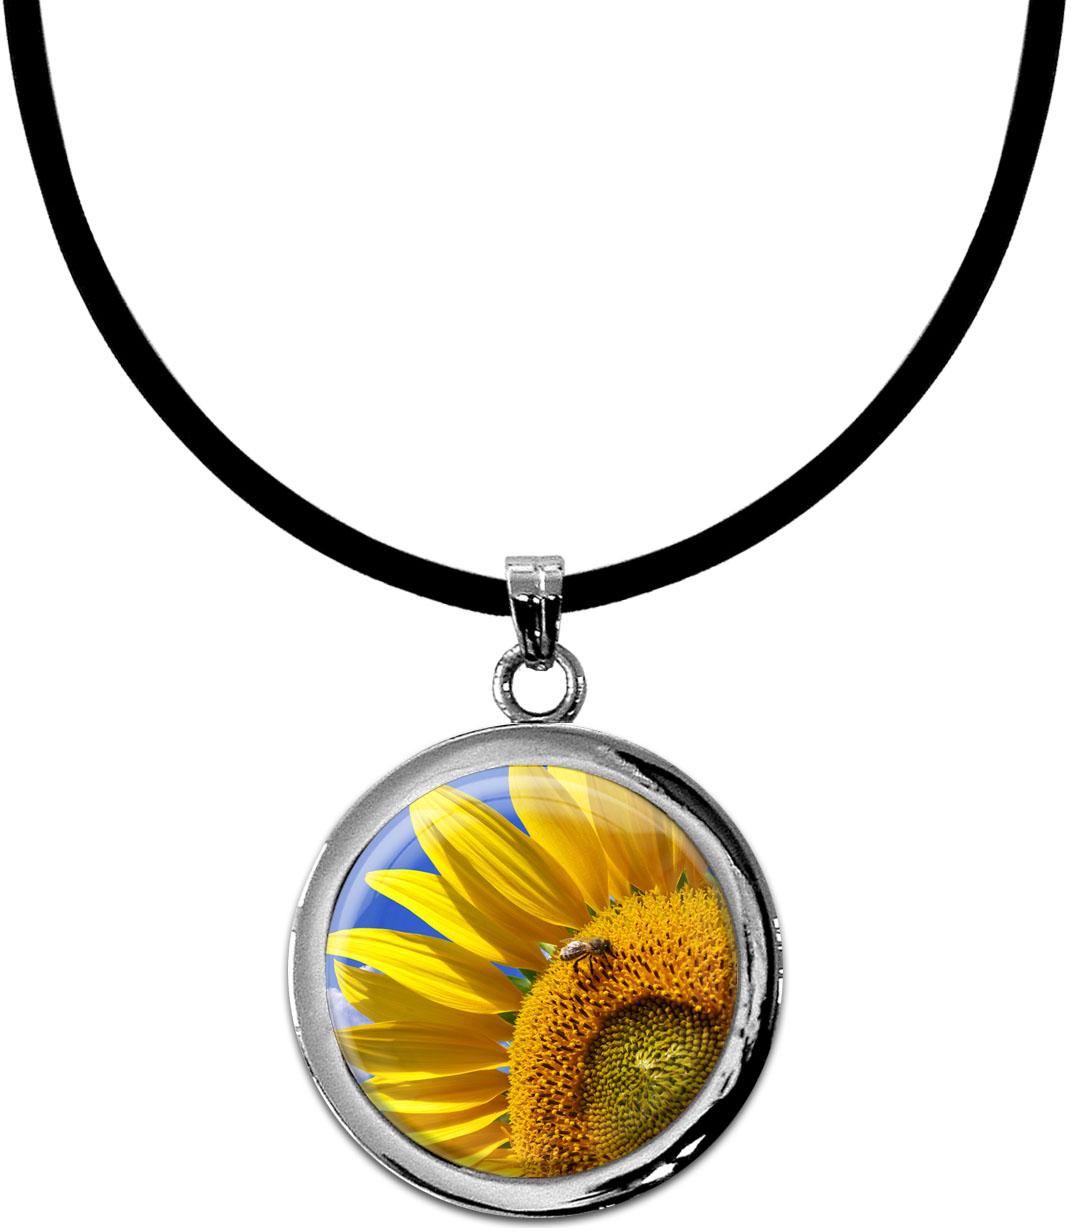 Kettenanhänger / Sonnenblume